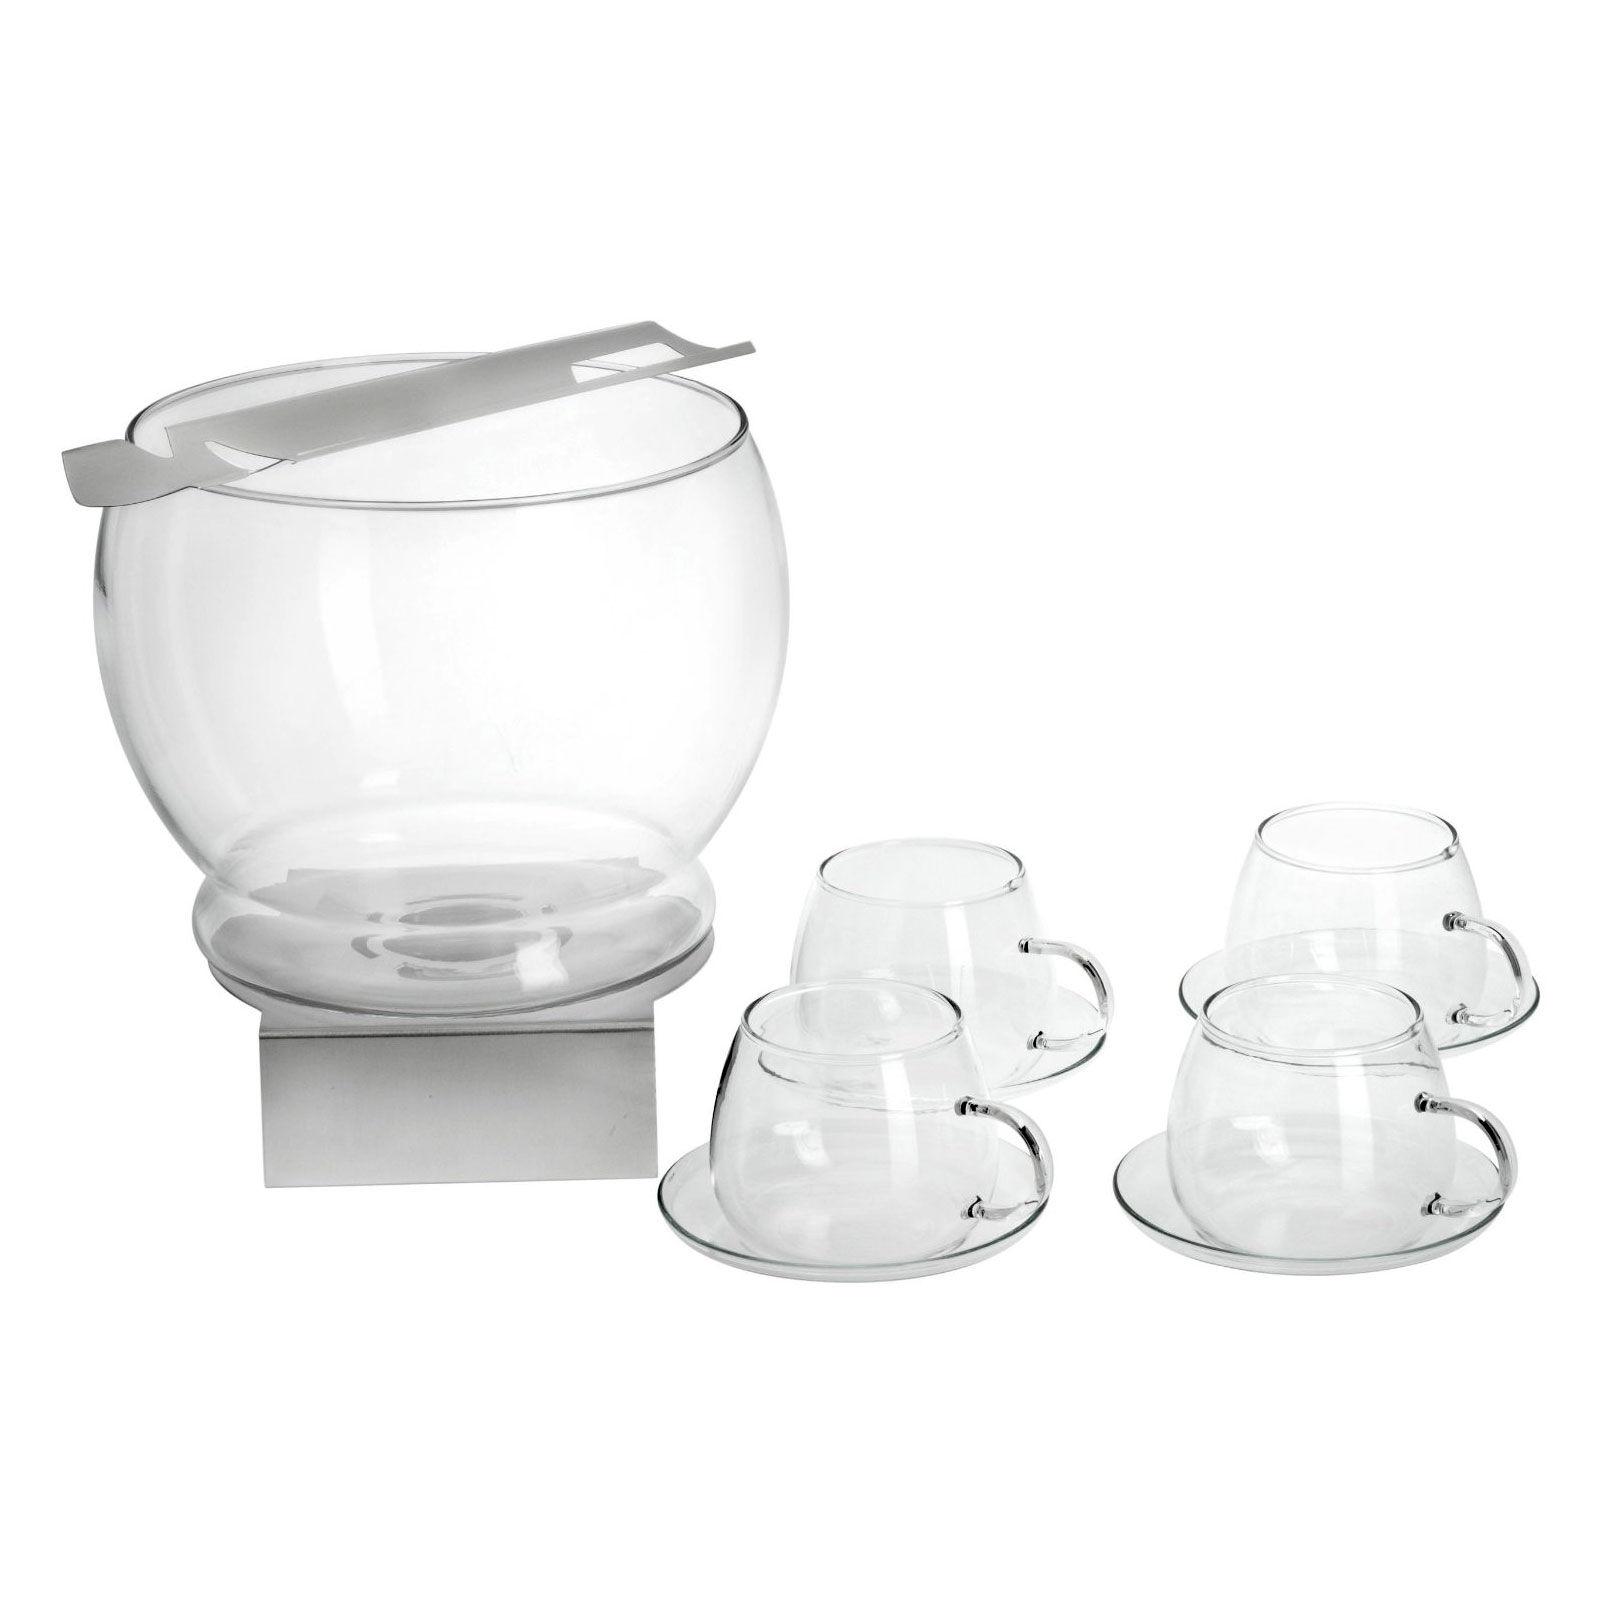 Cocktail-Gläser Bowle Archives - Cocktail-Gläser